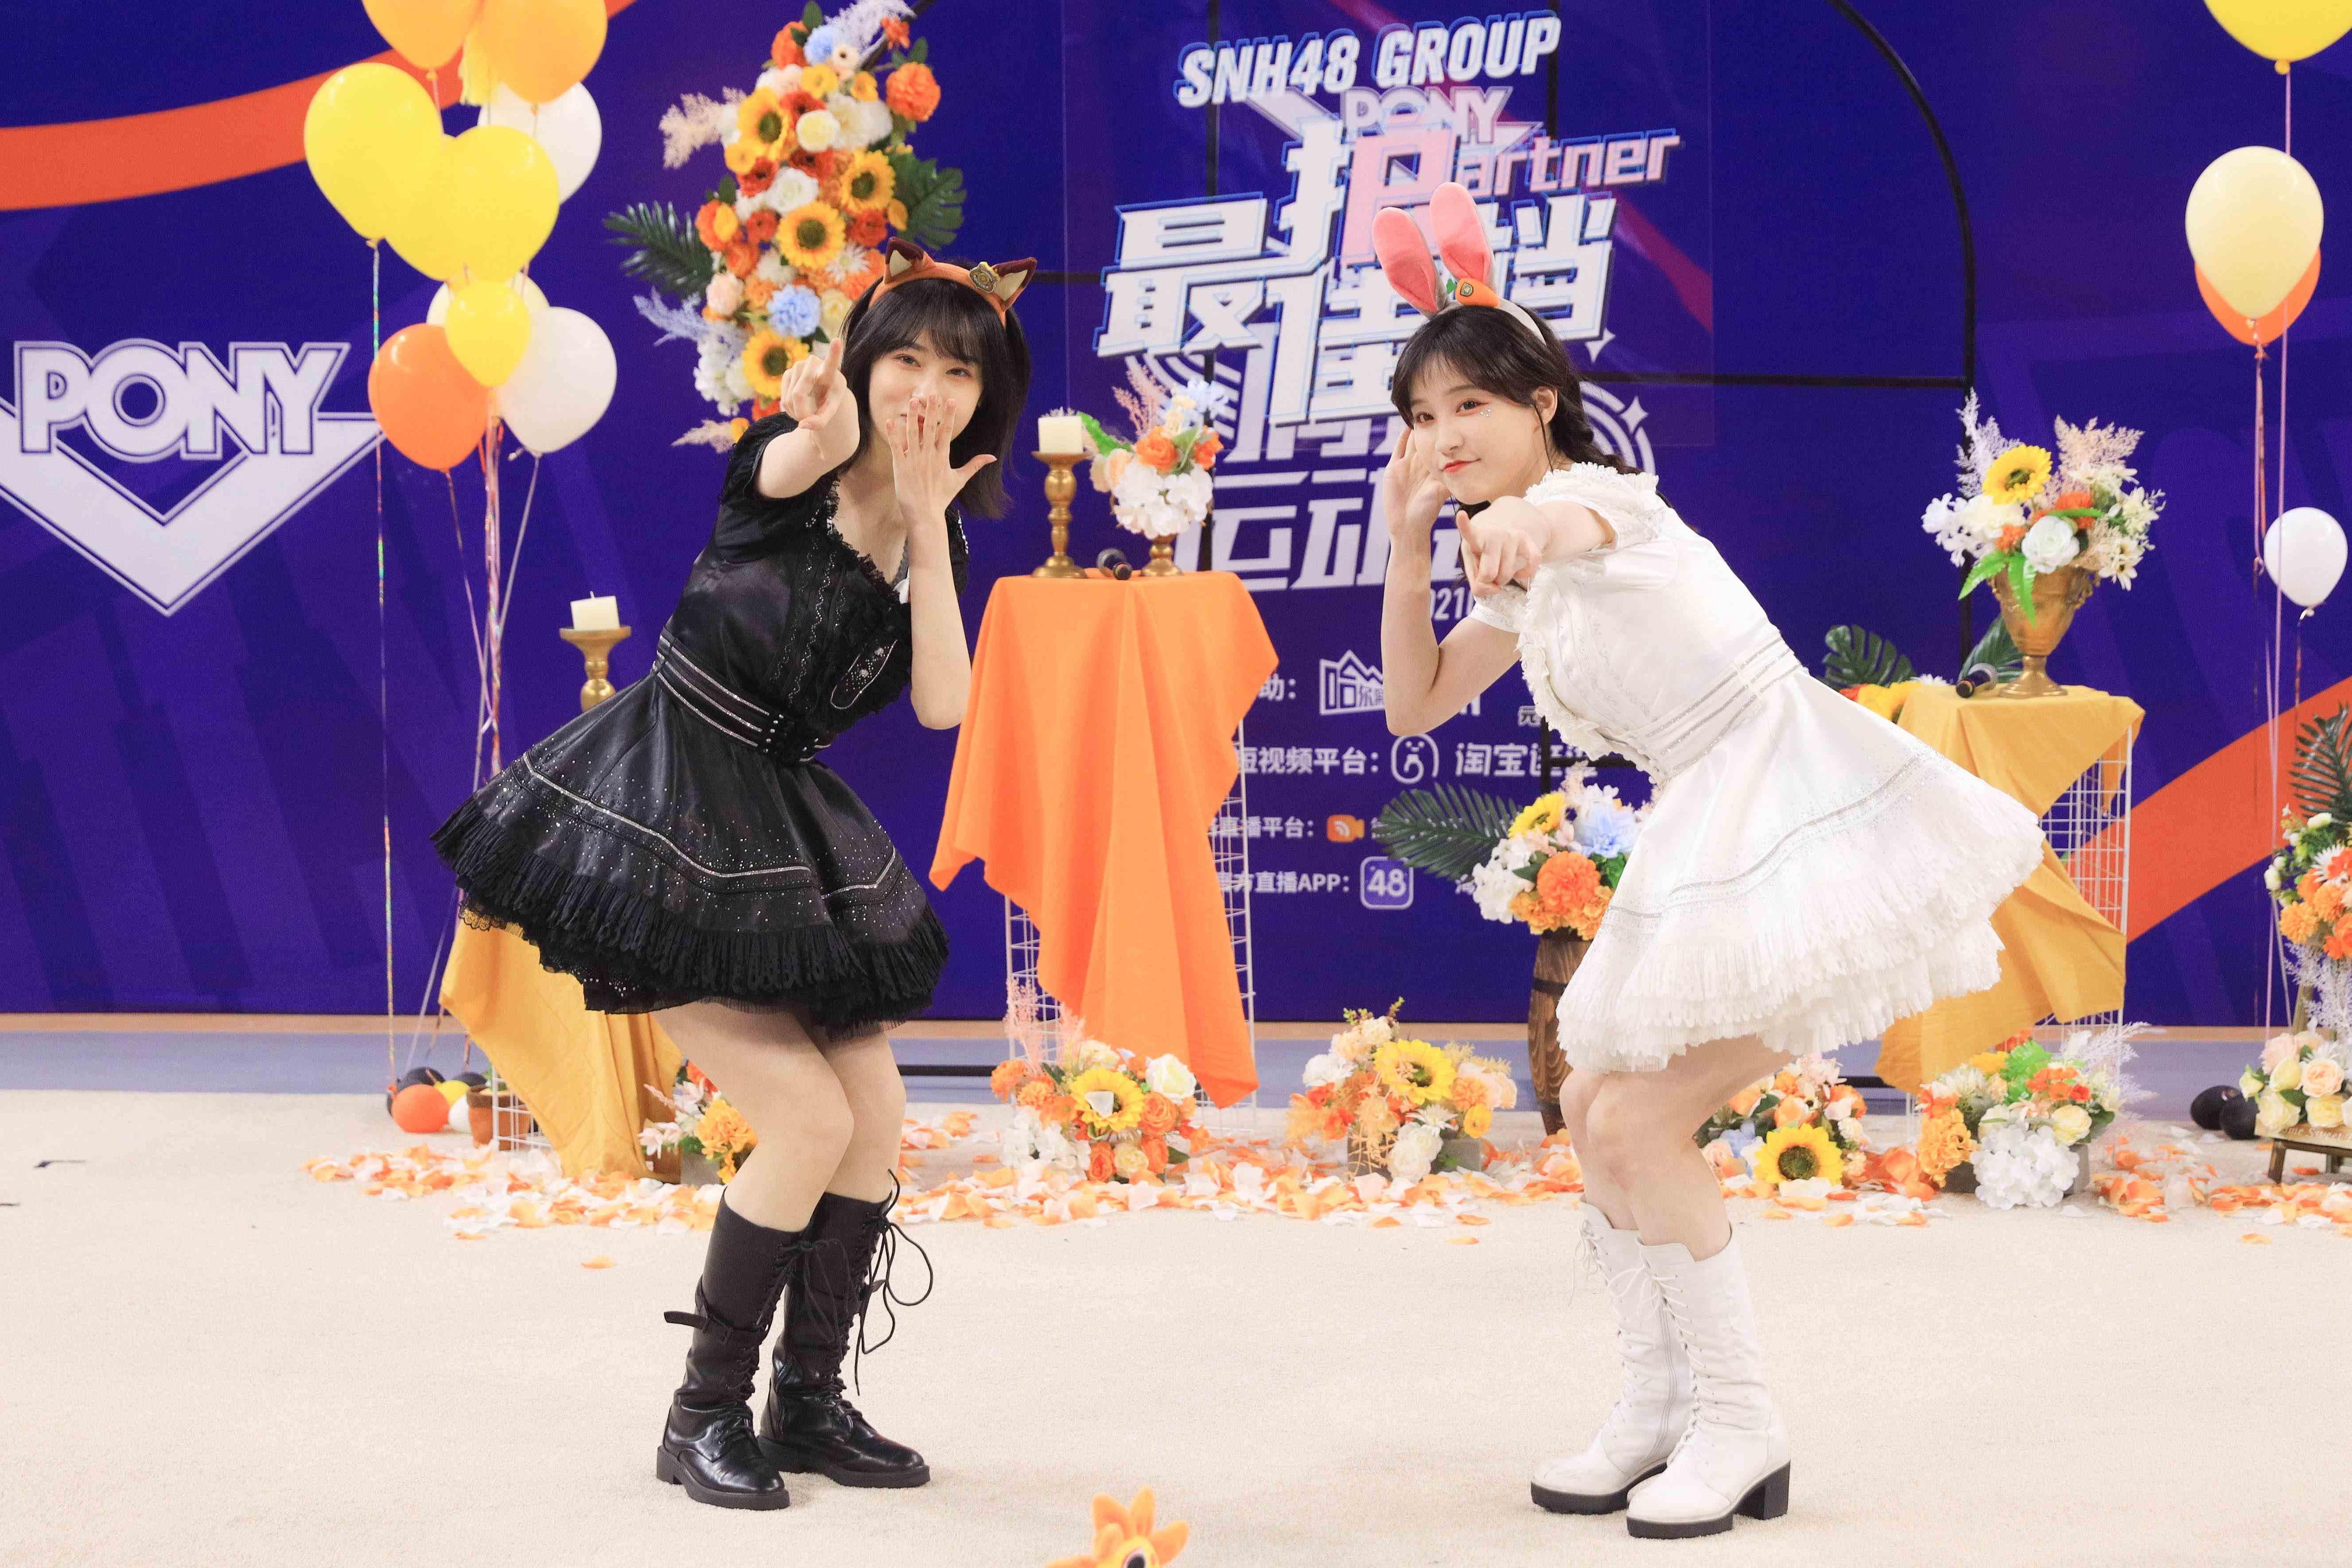 SNH48 FAMILY第三届偶像运动会圆满举办 (1).jpg